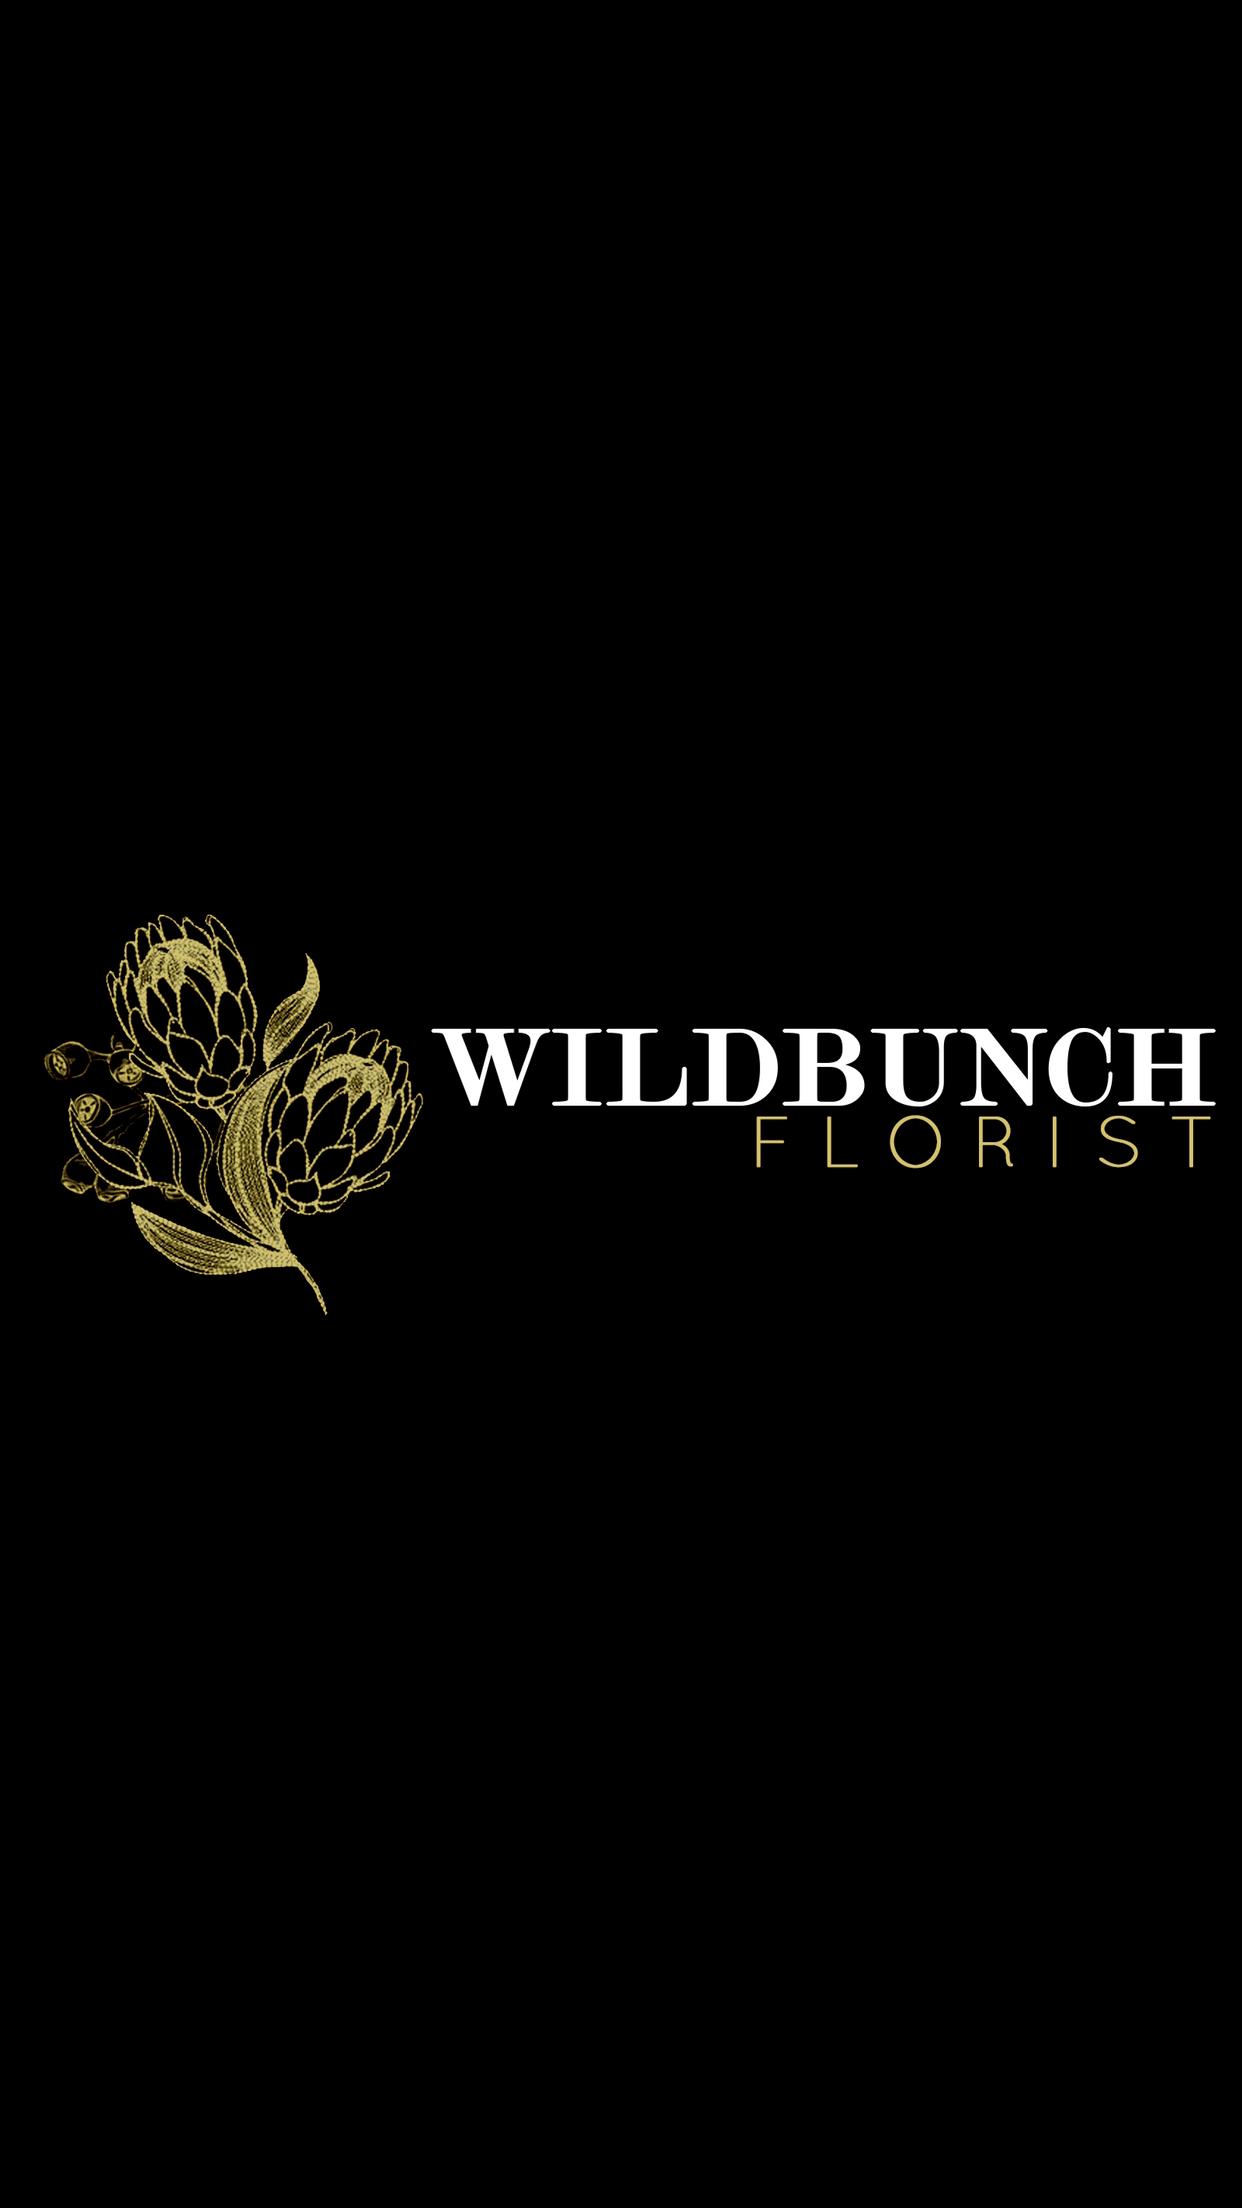 Wild Bunch Florist